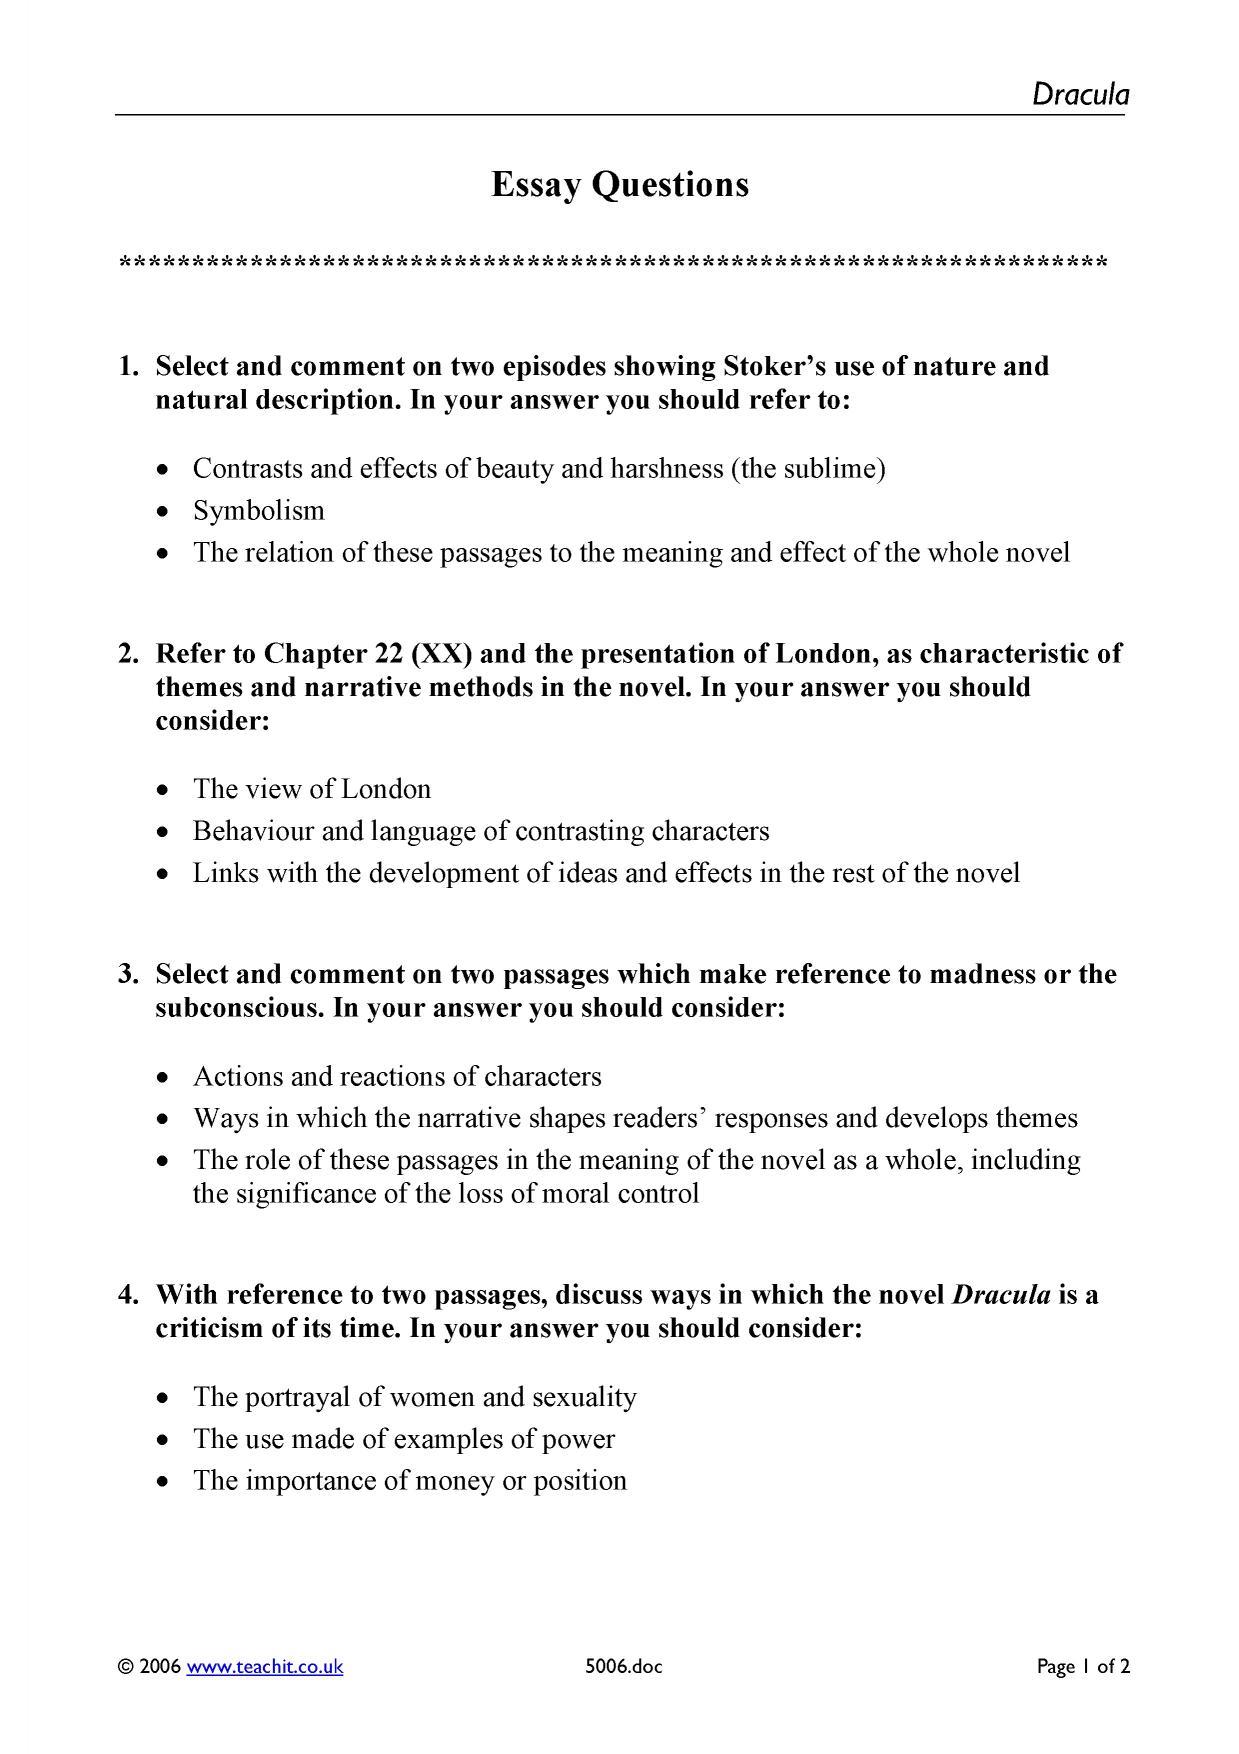 inherent values of dracula essay